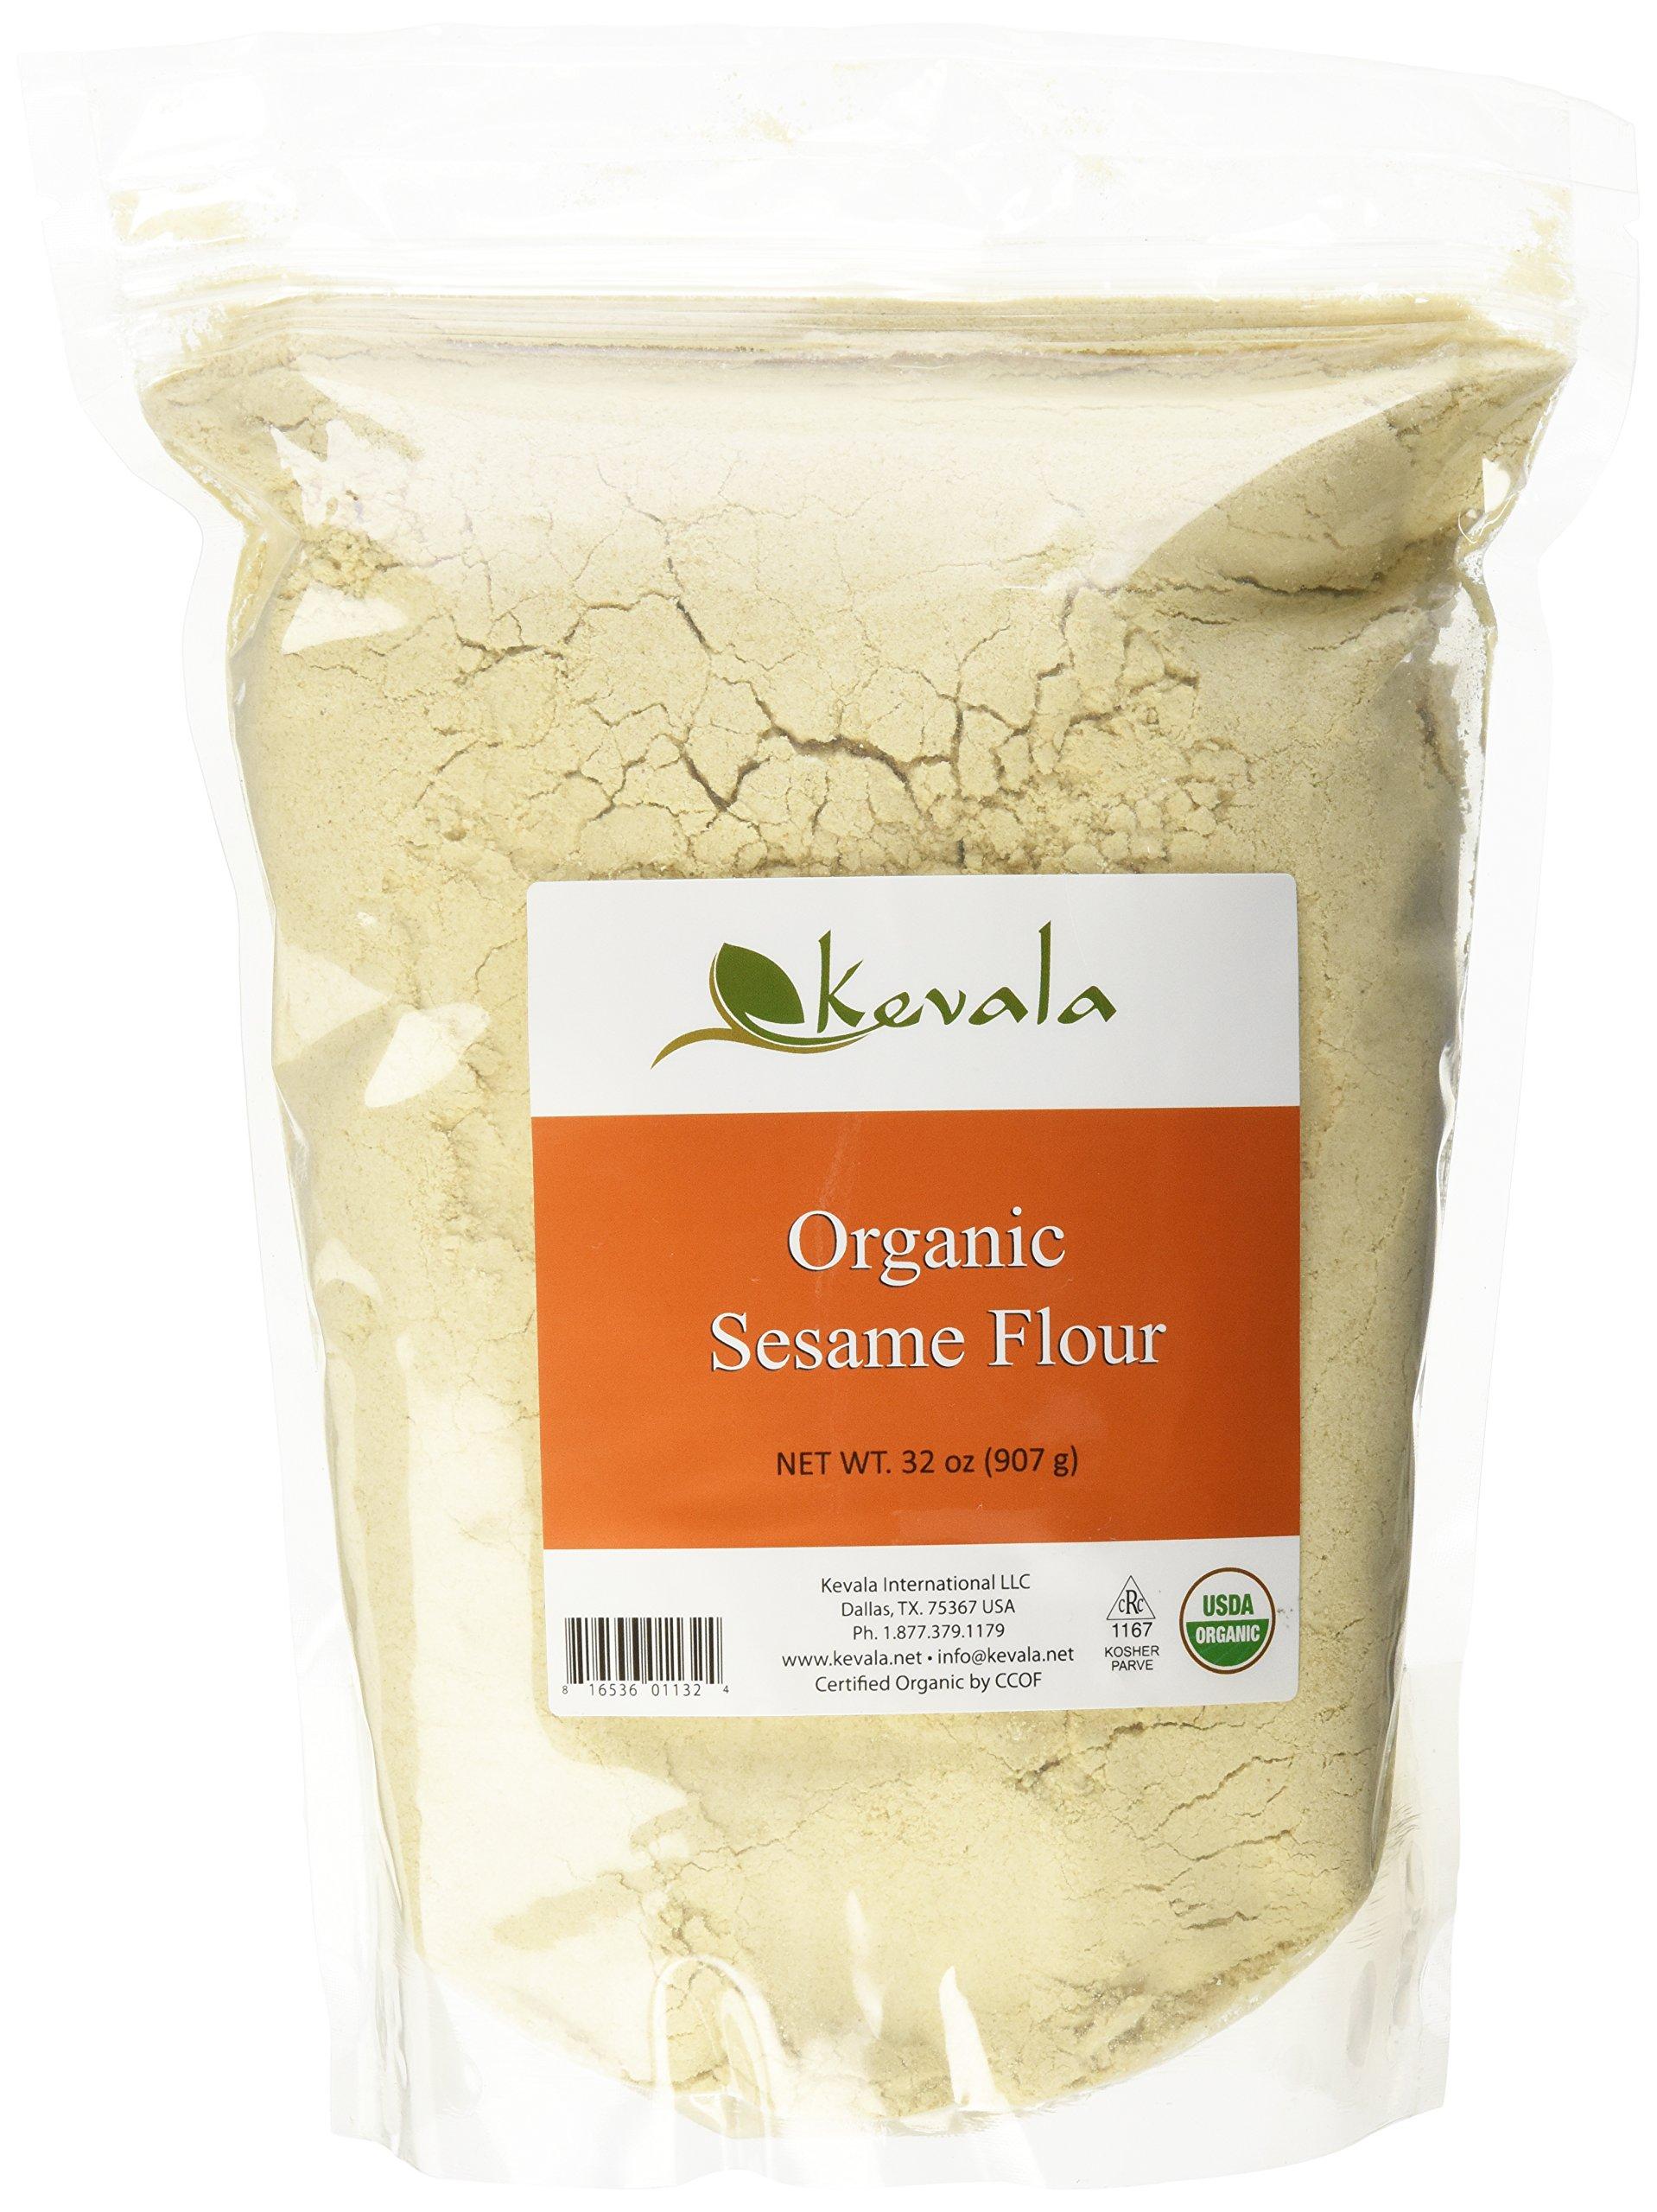 Kevala Organic Sesame Flour 2 lb